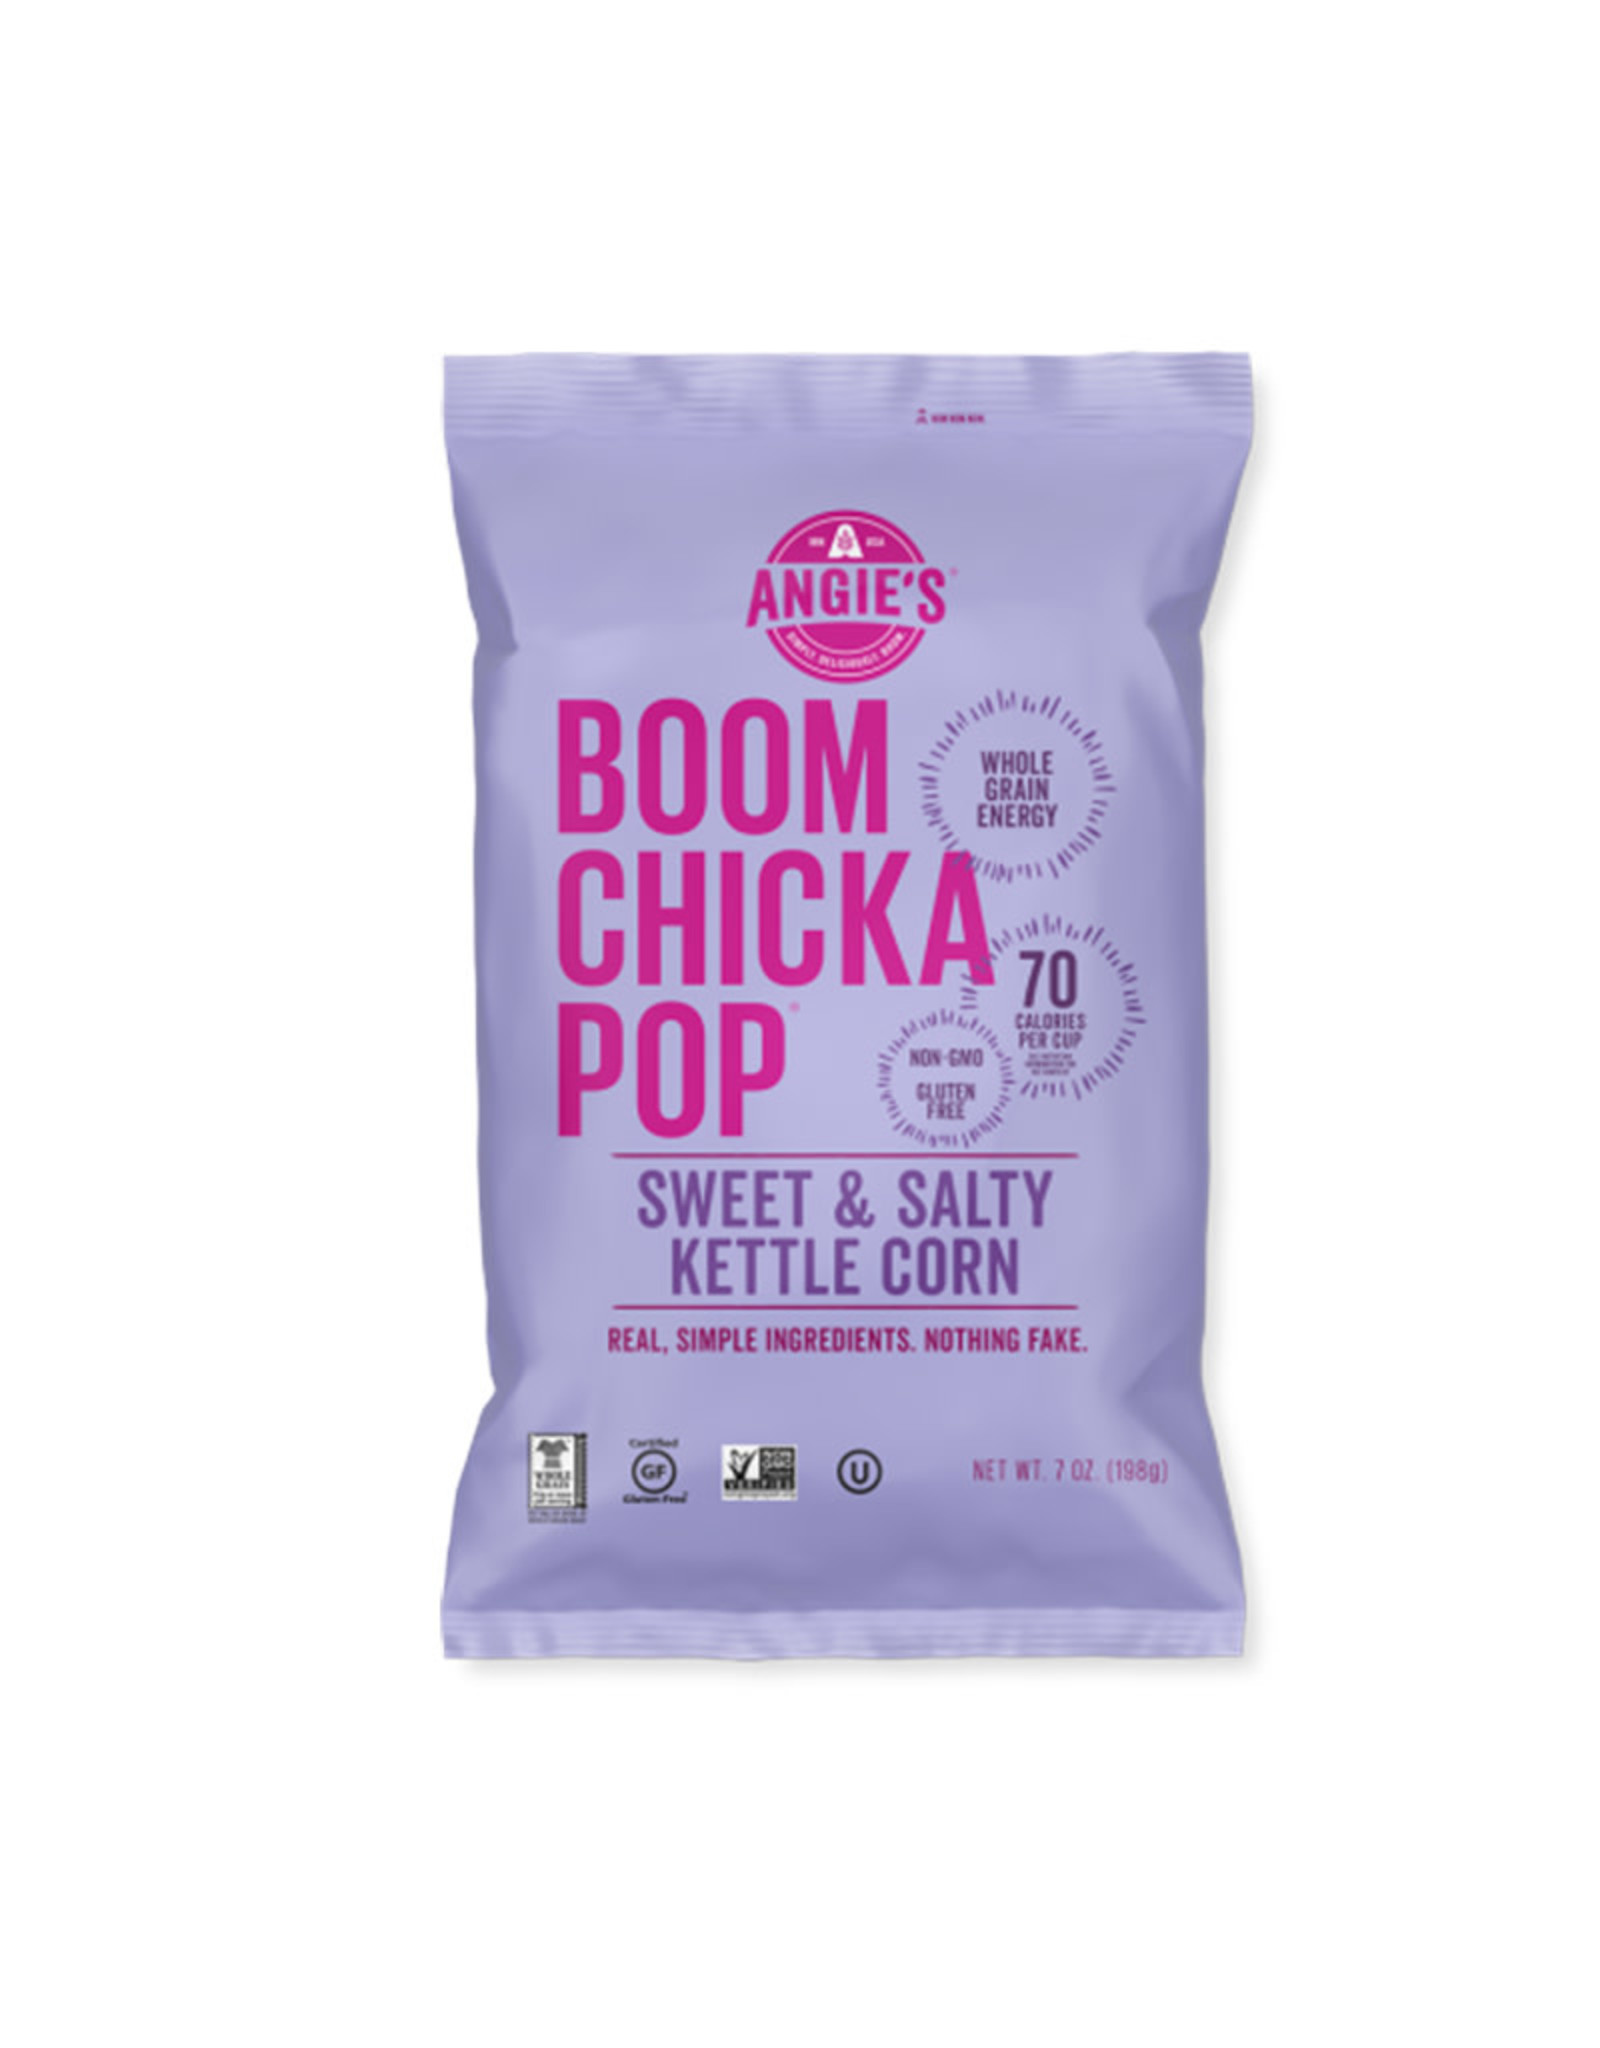 Angies BOOMCHICKAPOP Angie's BOOMCHICKAPOP - Popcorn, Sweet & Salty (198g)